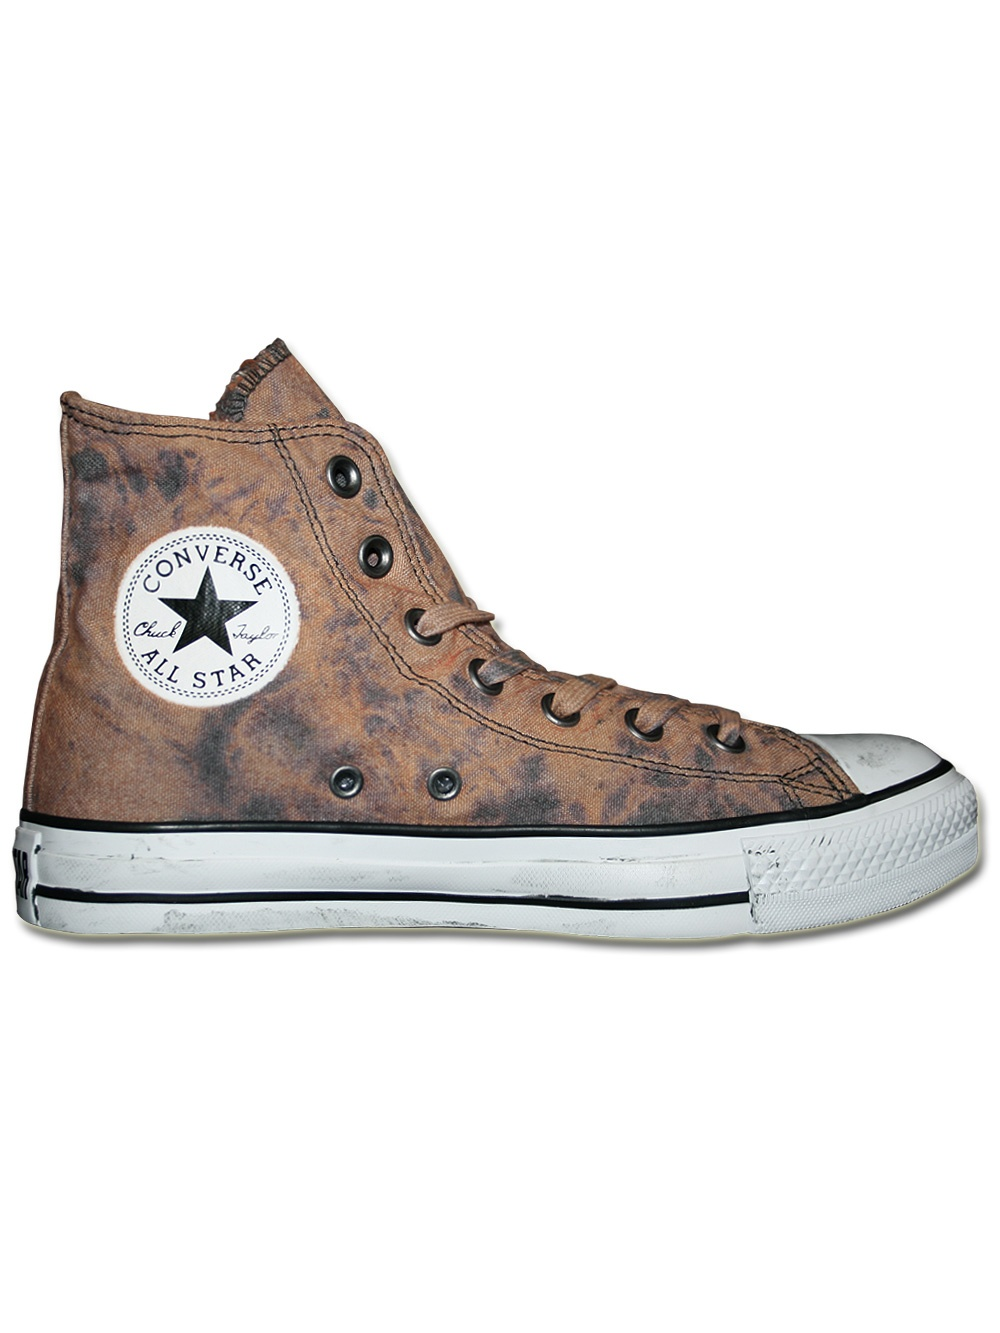 converse chucks all star converse 6295 schuhe g nstig. Black Bedroom Furniture Sets. Home Design Ideas